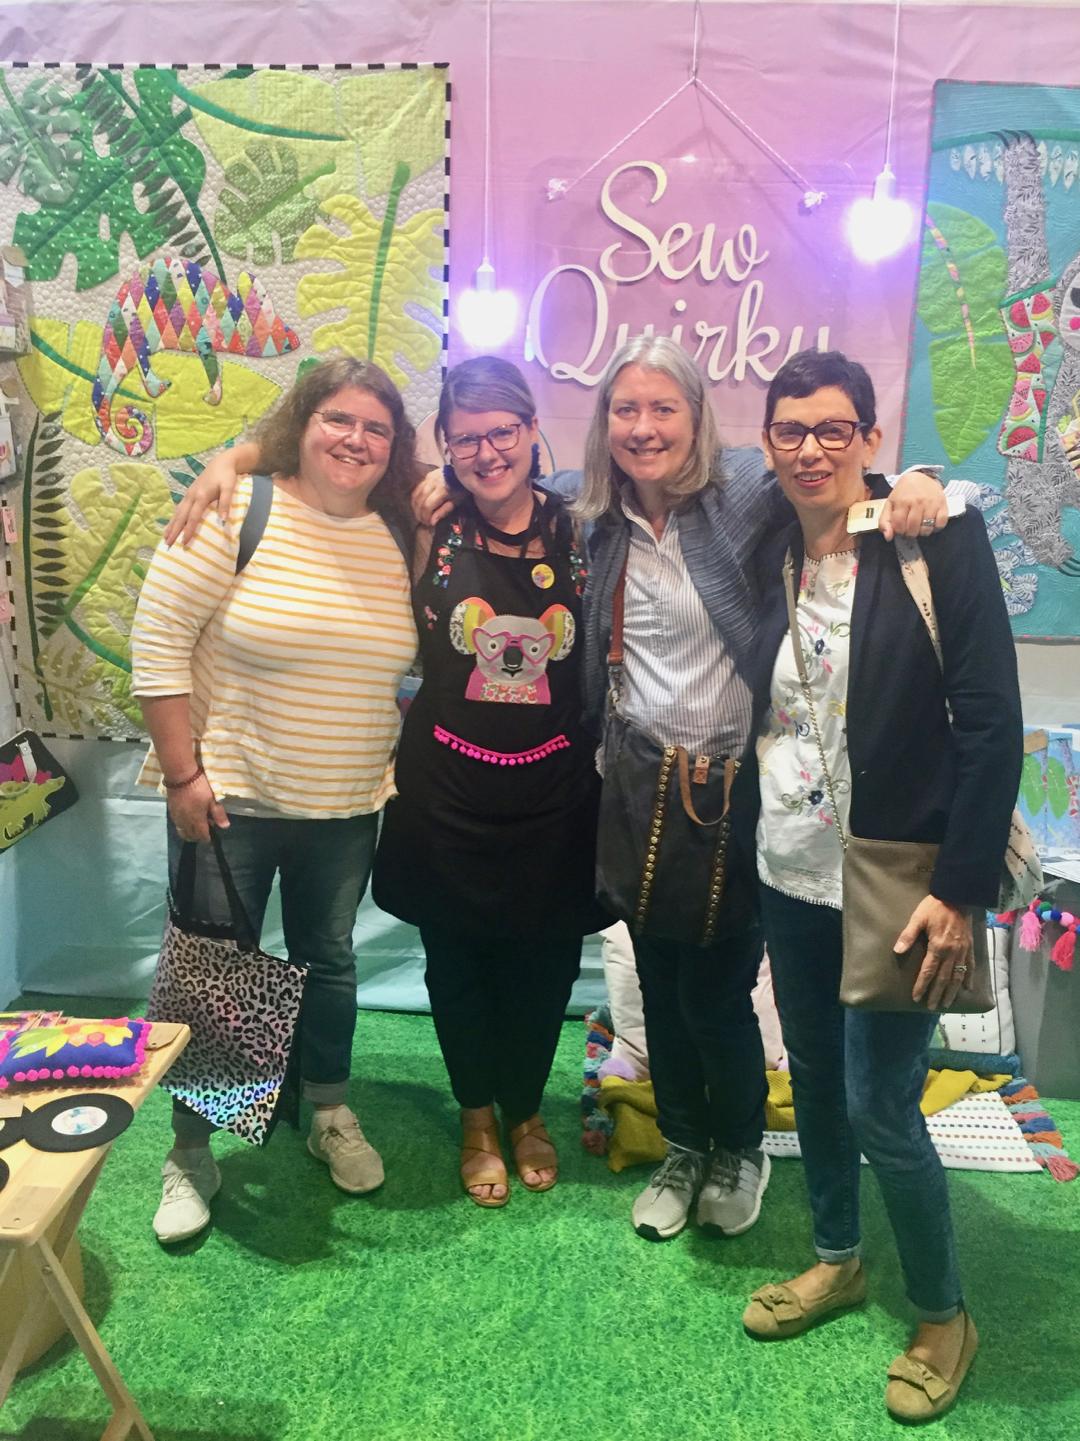 Sew Quirky in Birmingham